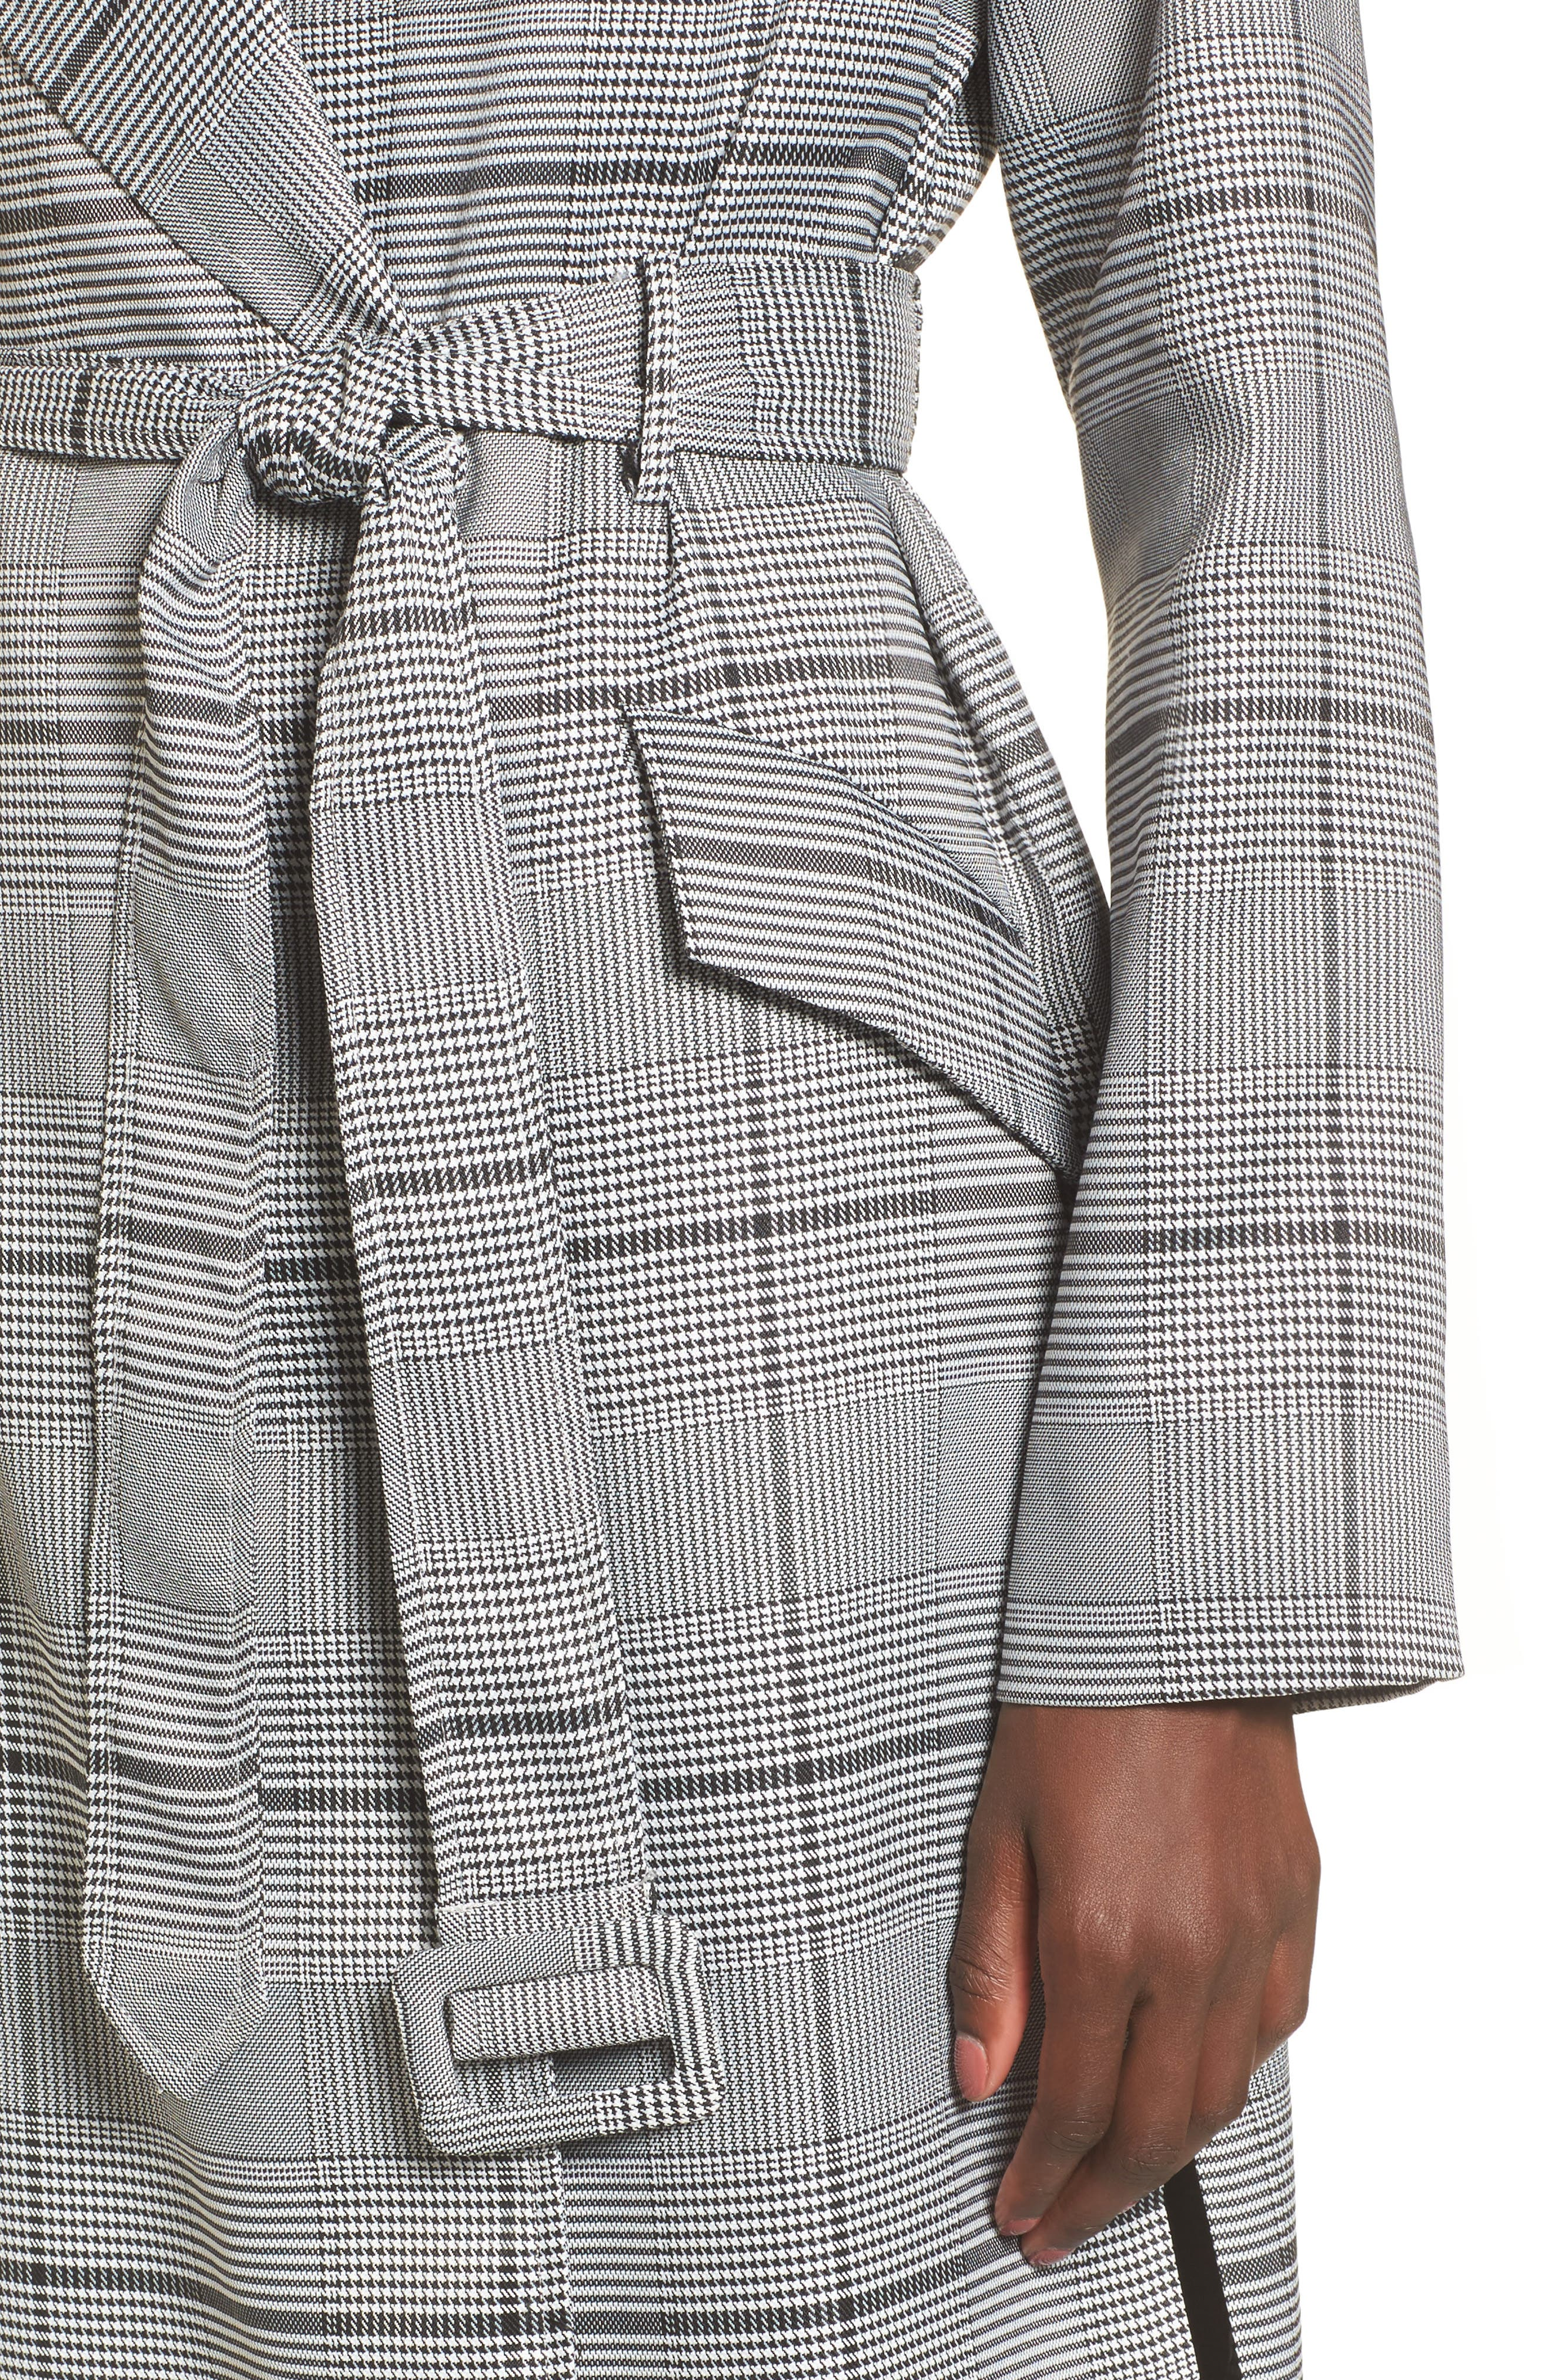 Plaid Menswear Coat,                             Alternate thumbnail 4, color,                             Black Plaid